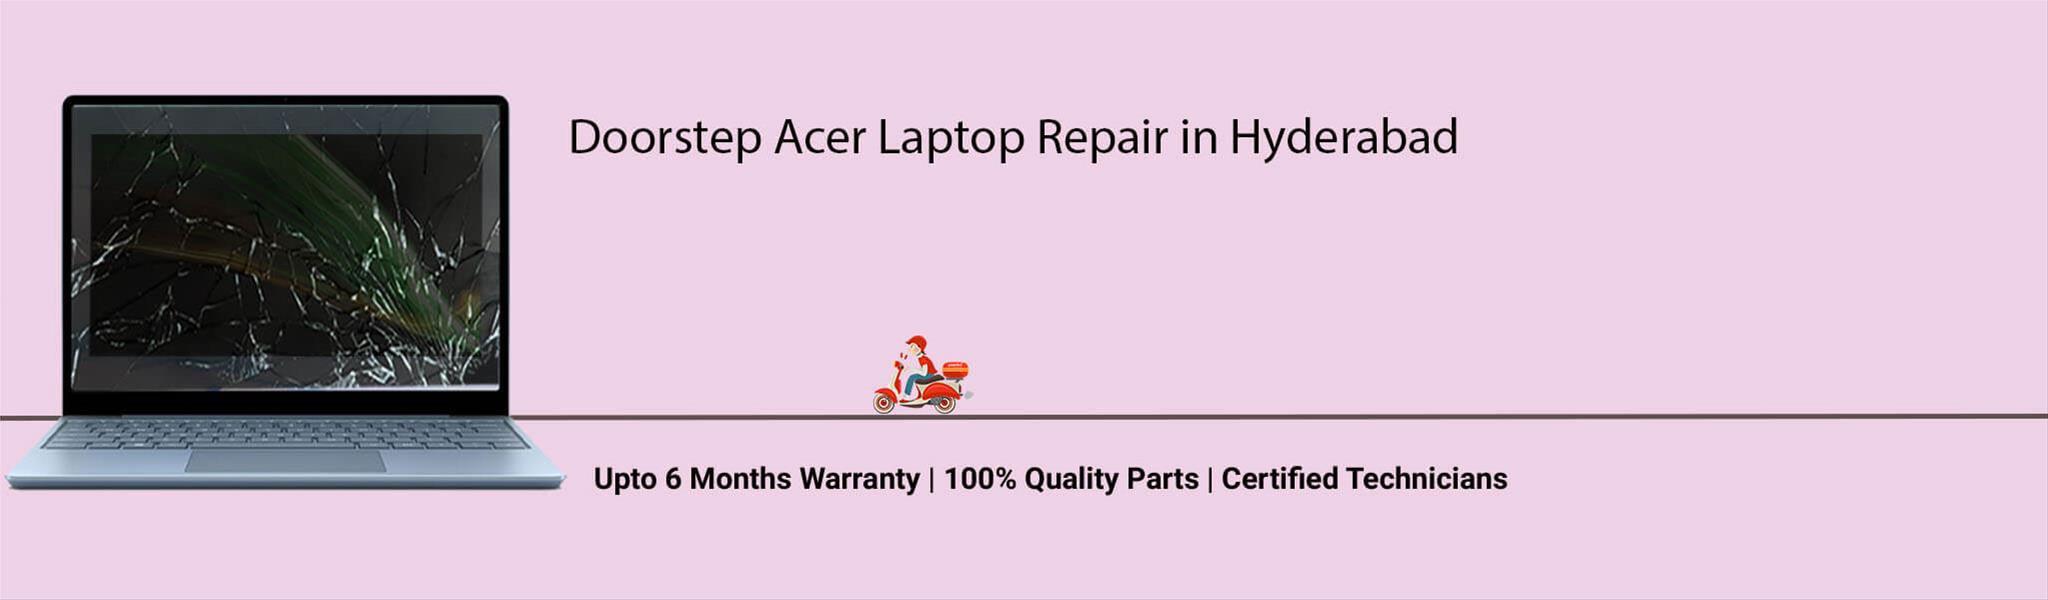 acer-laptop-banner-hyderabad.jpg